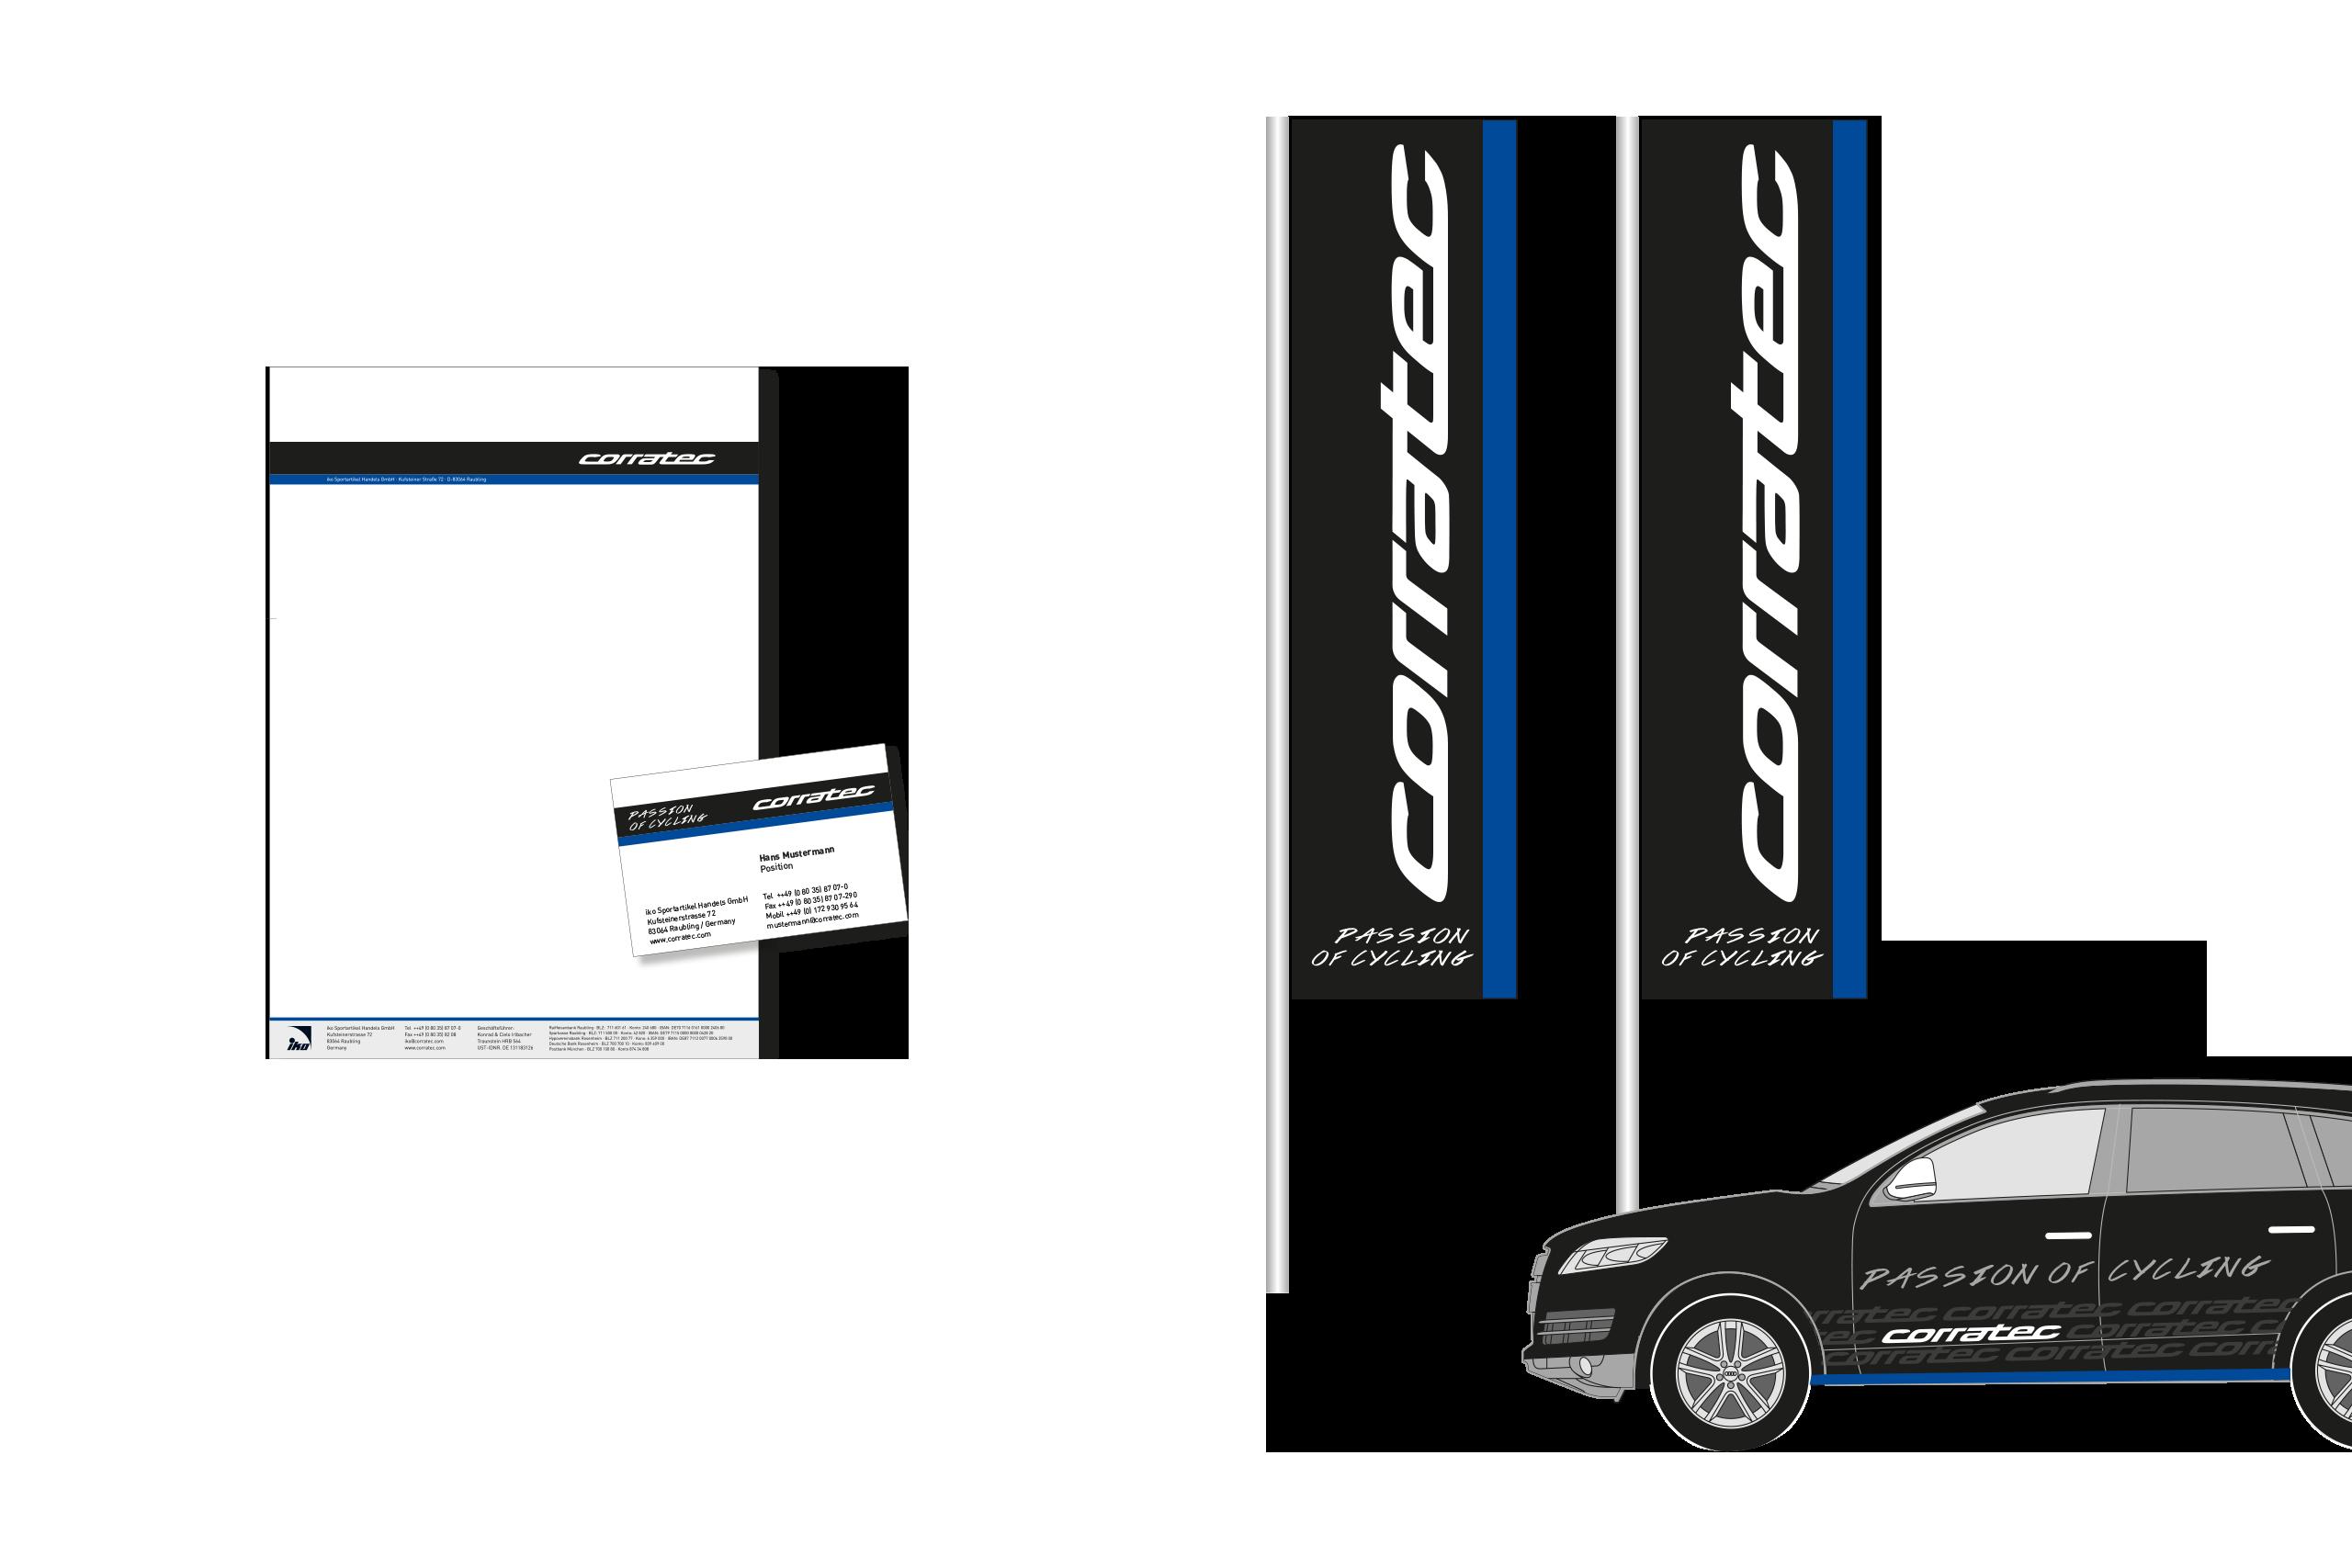 corratec - Designs